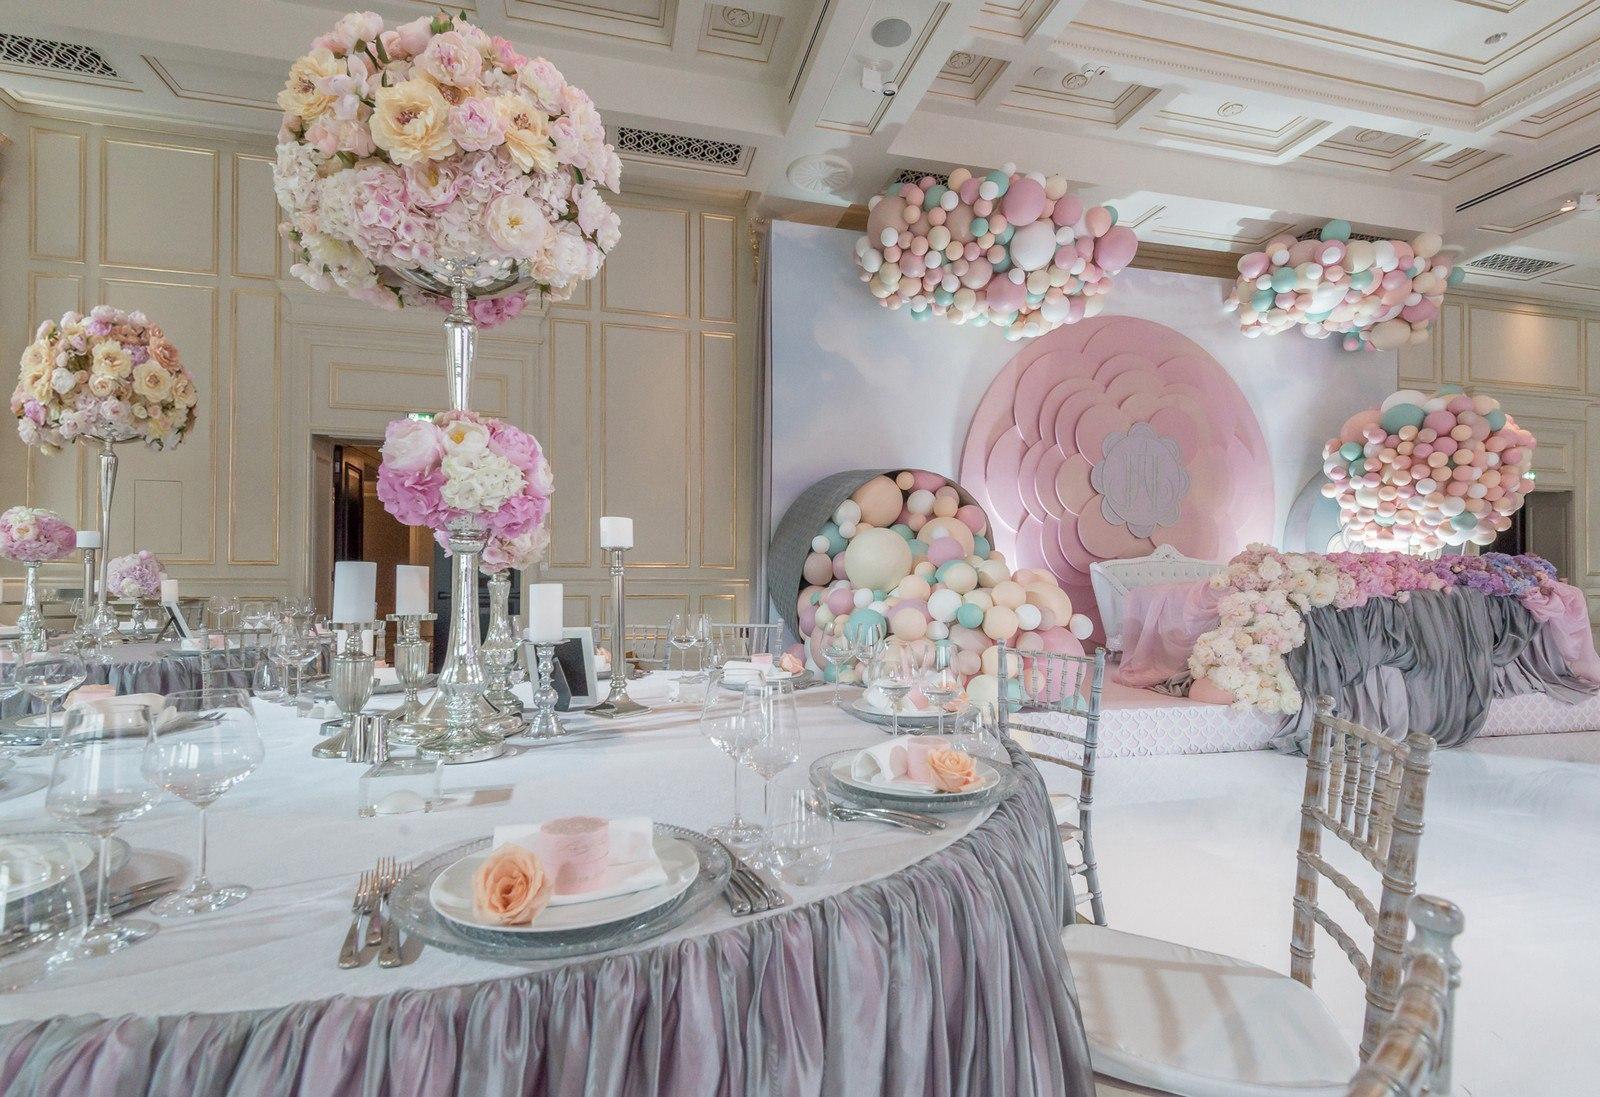 7cR URkv5kQ - Правила декорирования столов на свадьбе